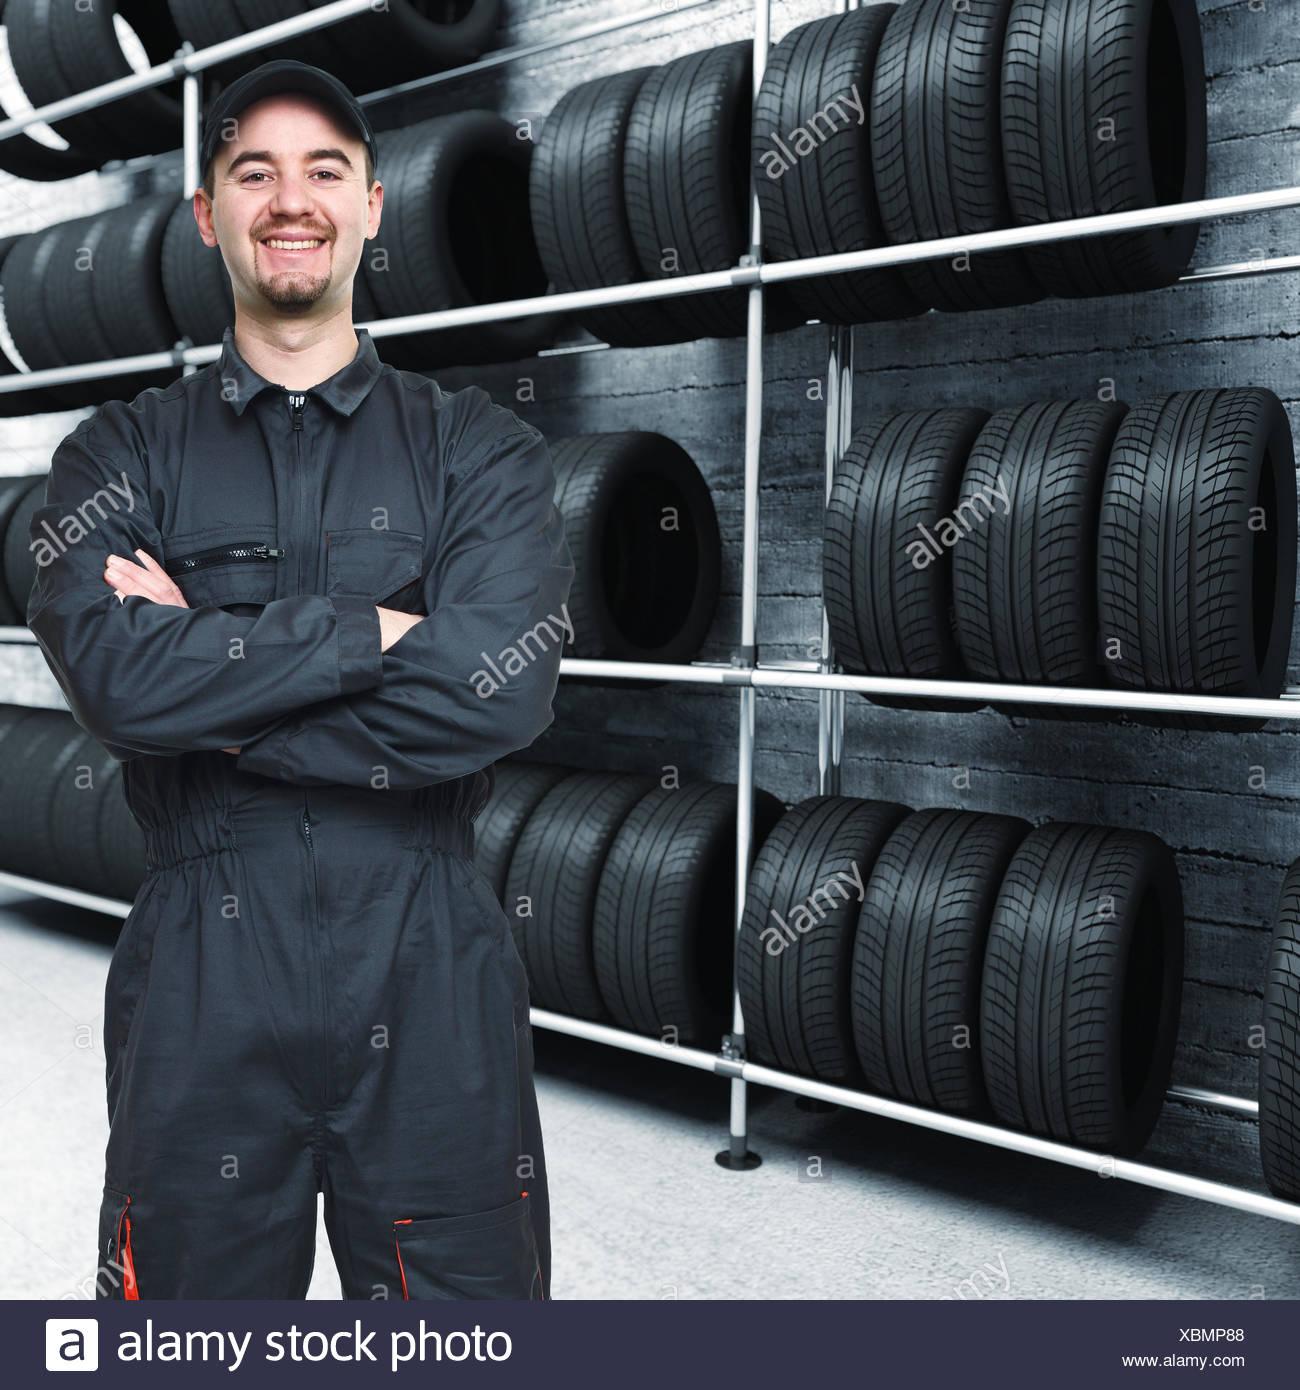 mechanic and garage background - Stock Image